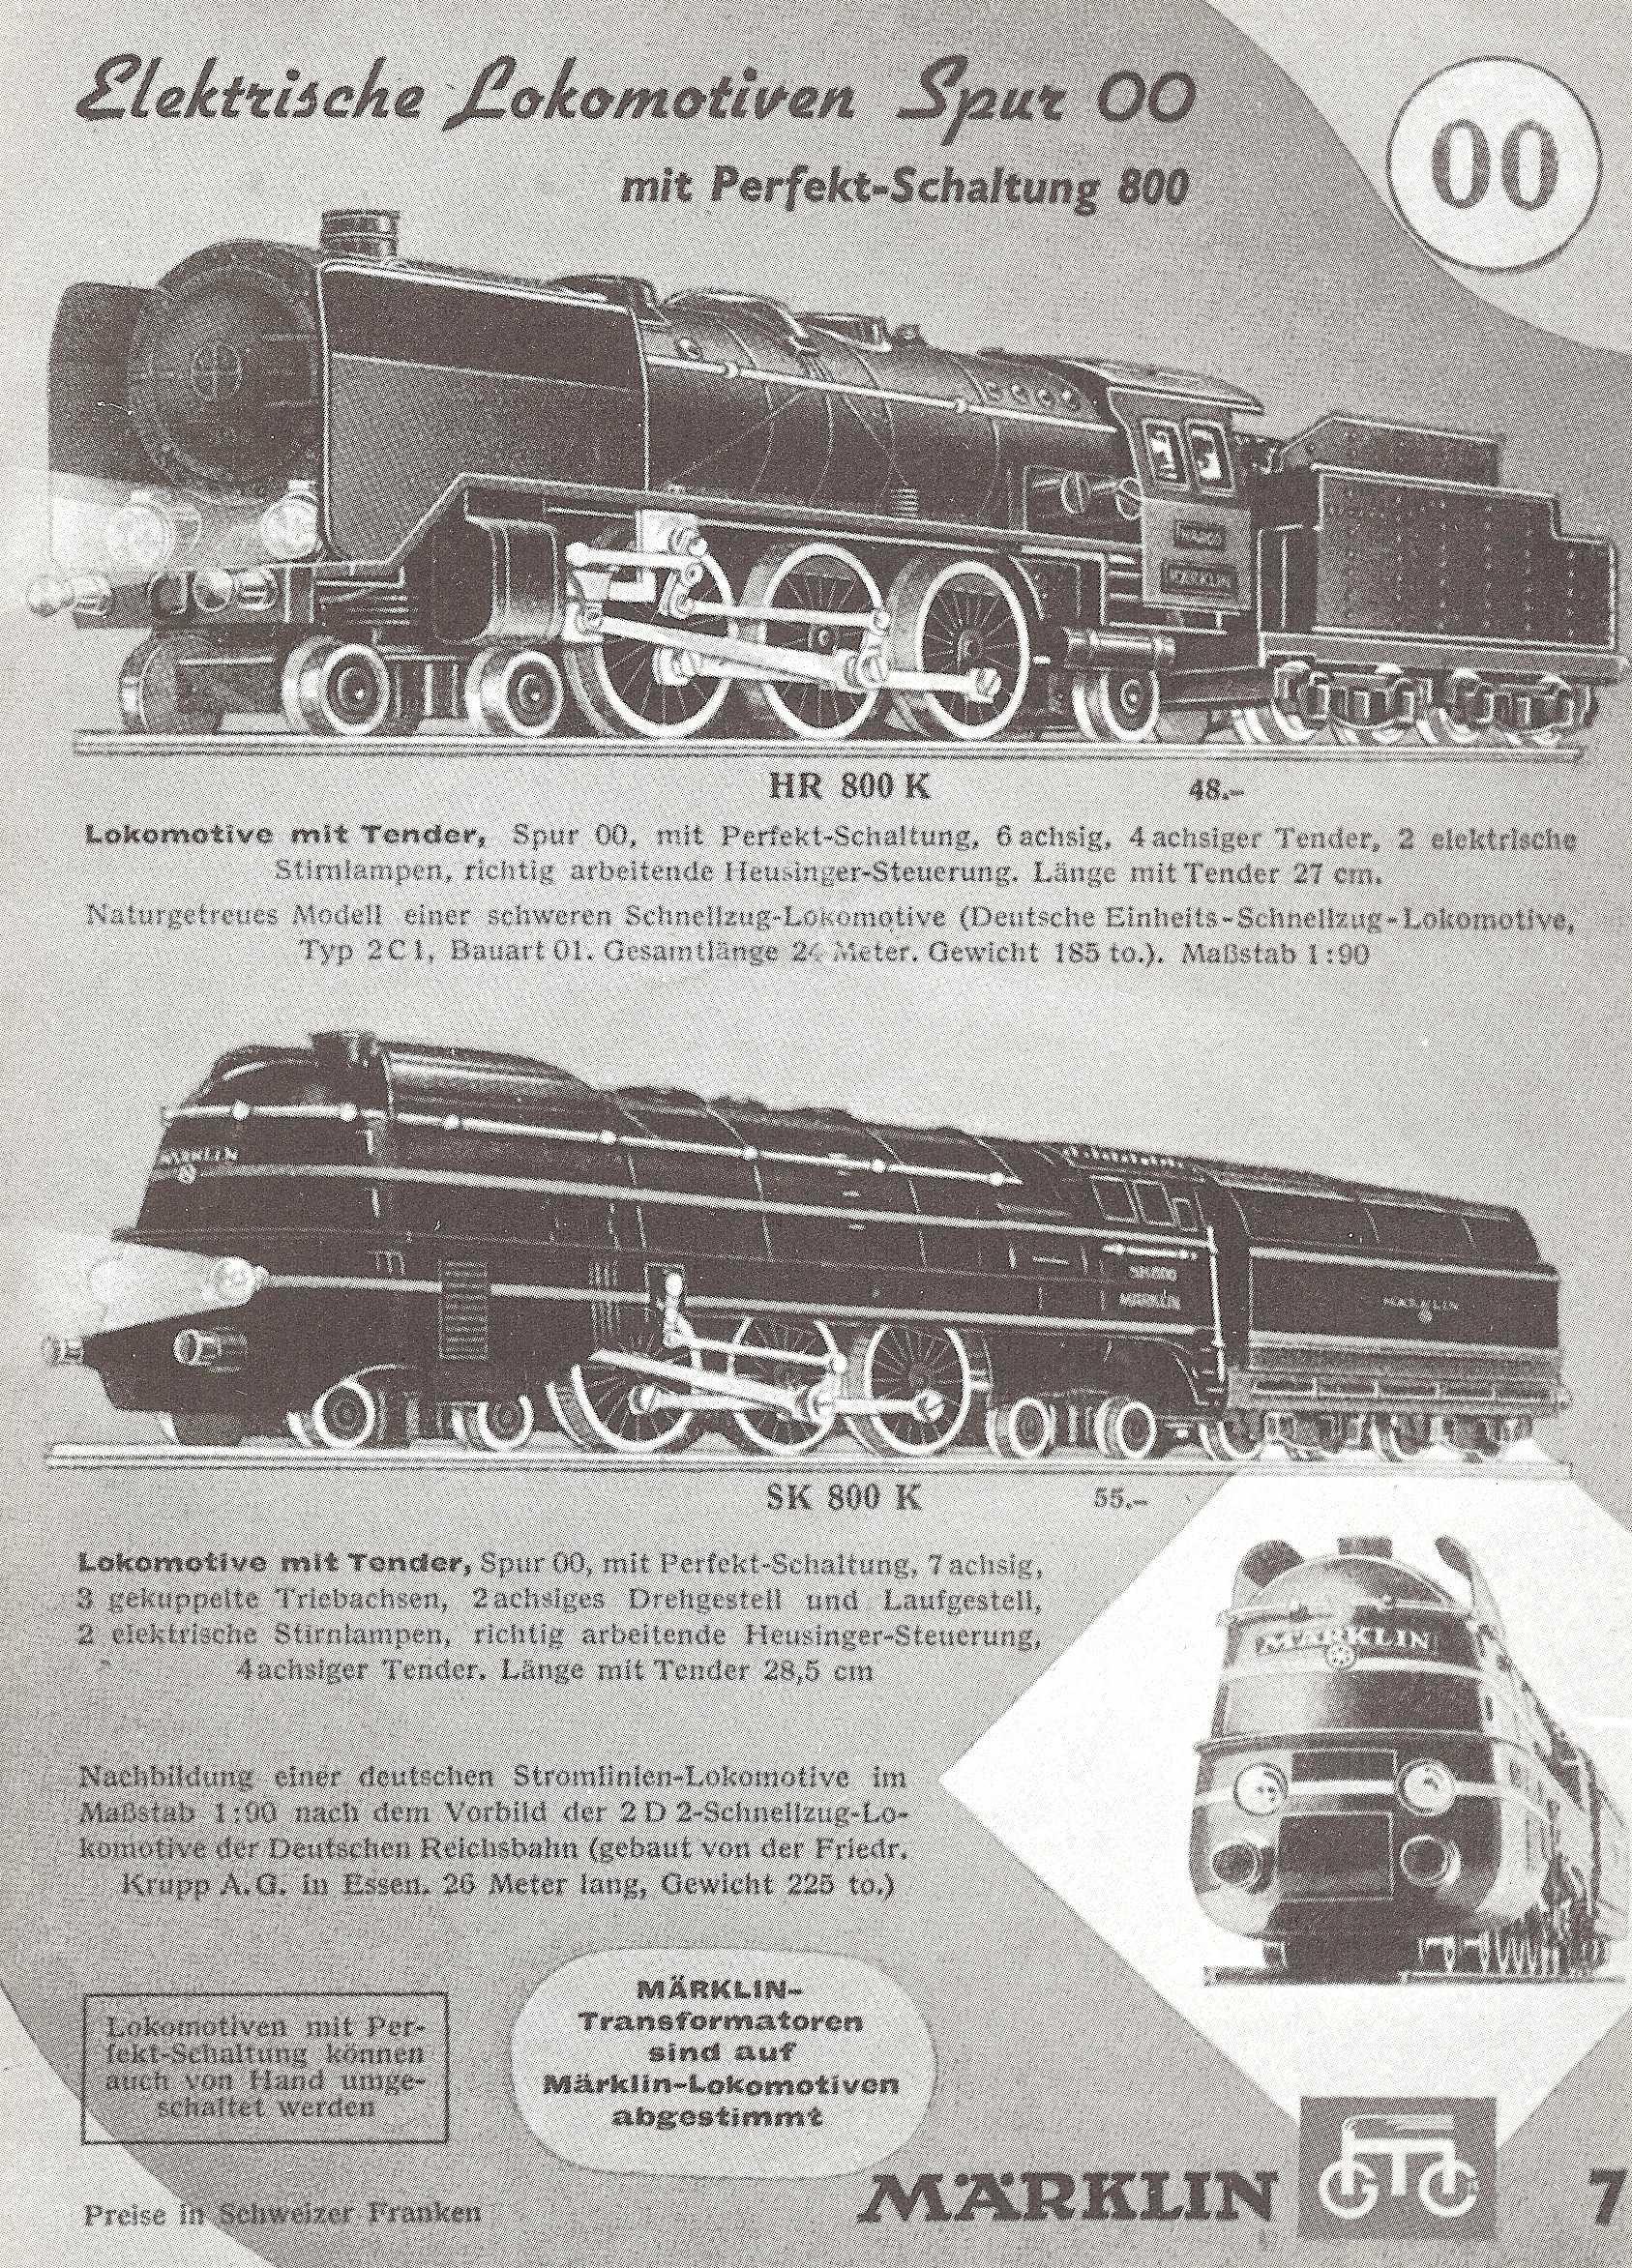 marklin 1940 - catalogue exclusivement de oo